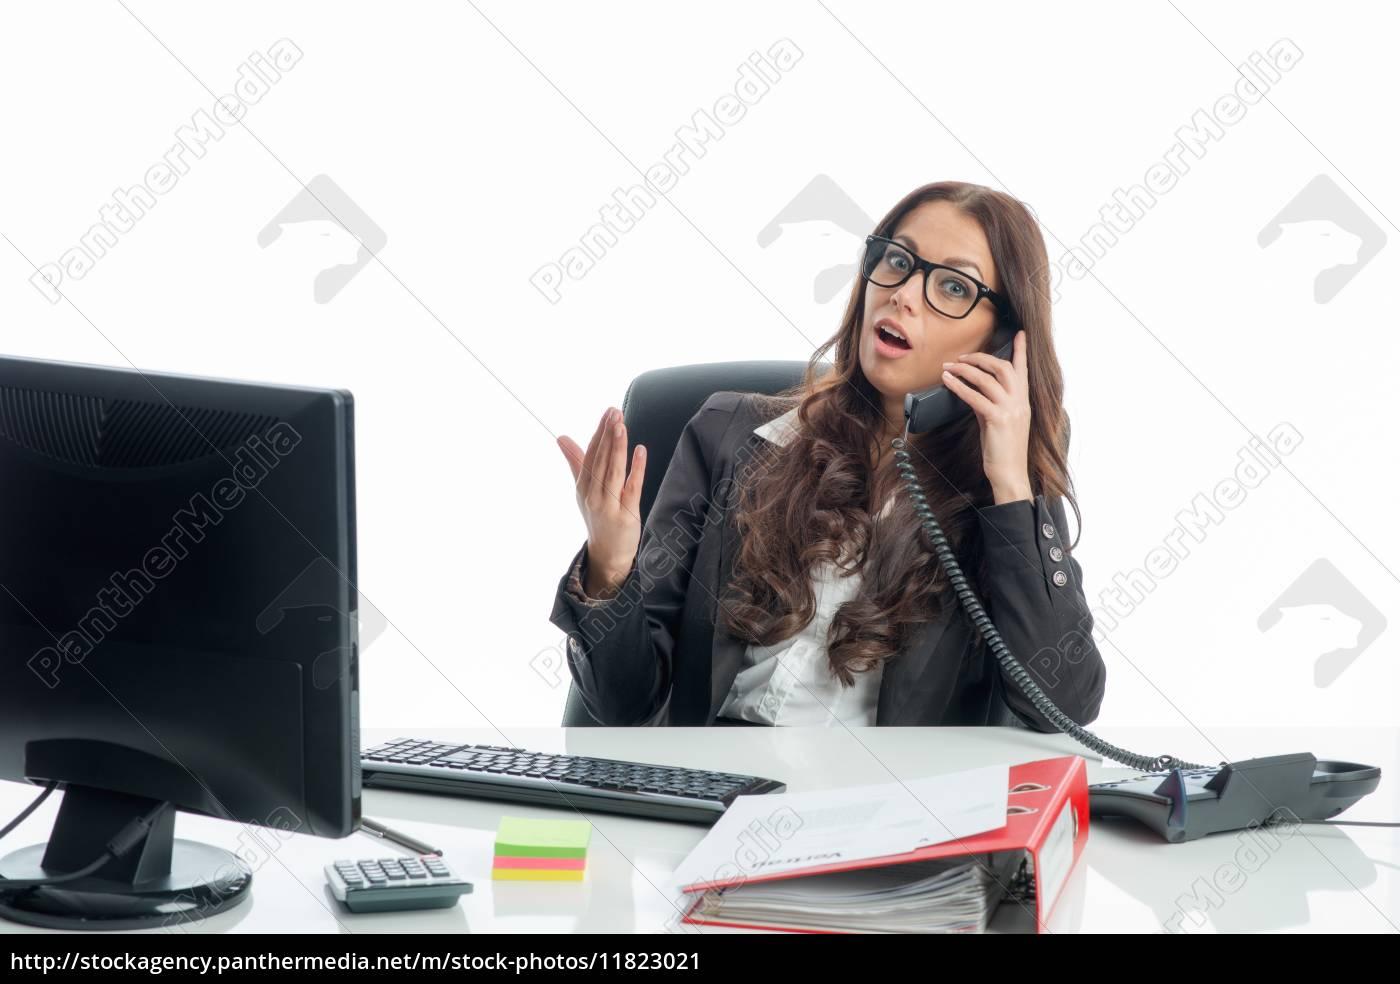 telefonat, am, schreibtisch - 11823021